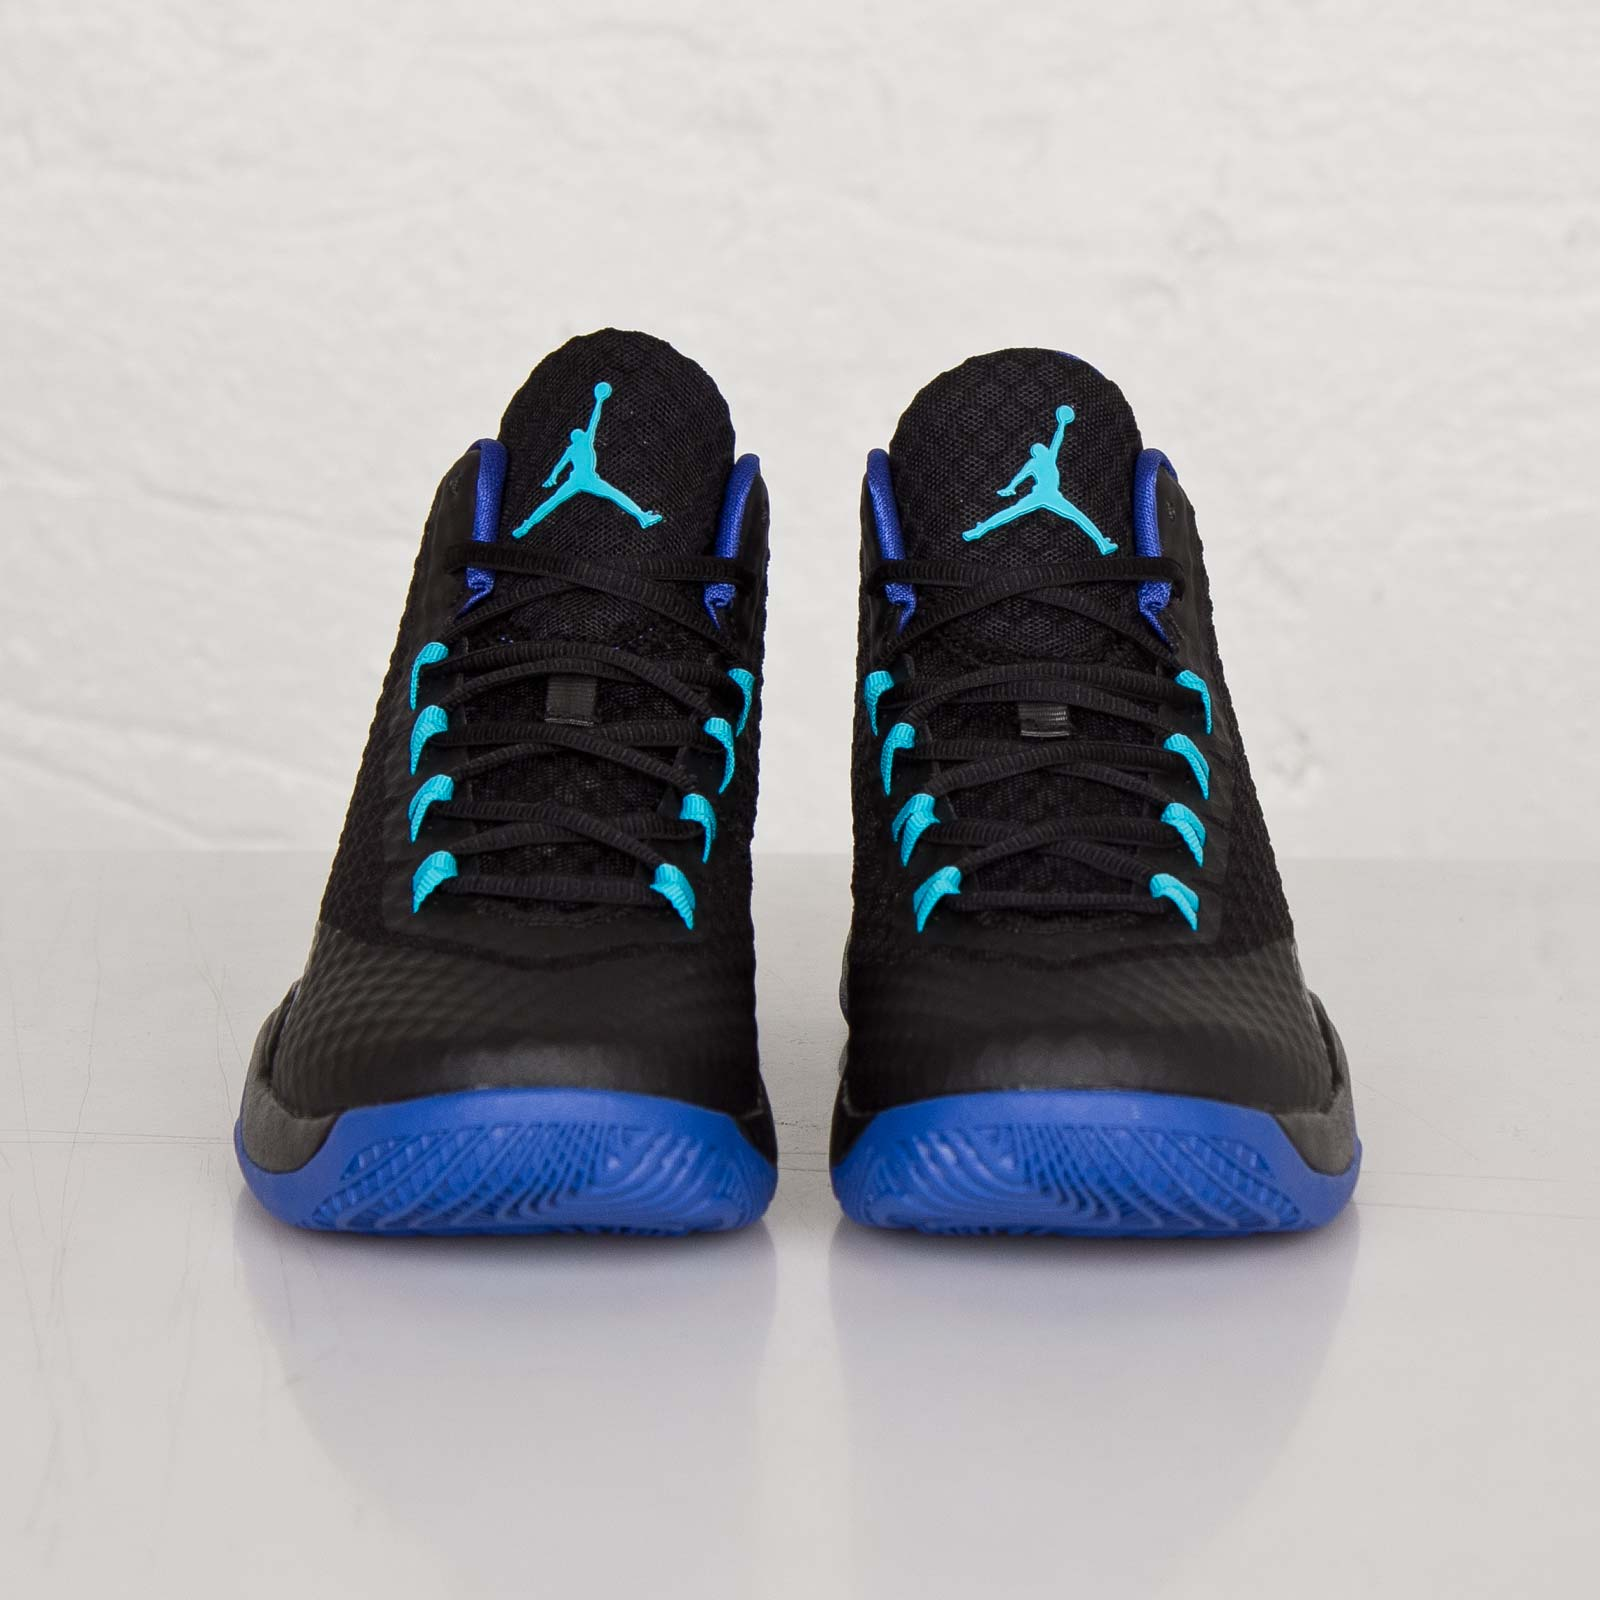 dbcf2aadaa6 Jordan Brand Jordan Superfly 3 PO (GS) - 724947-017 - Sneakersnstuff ...